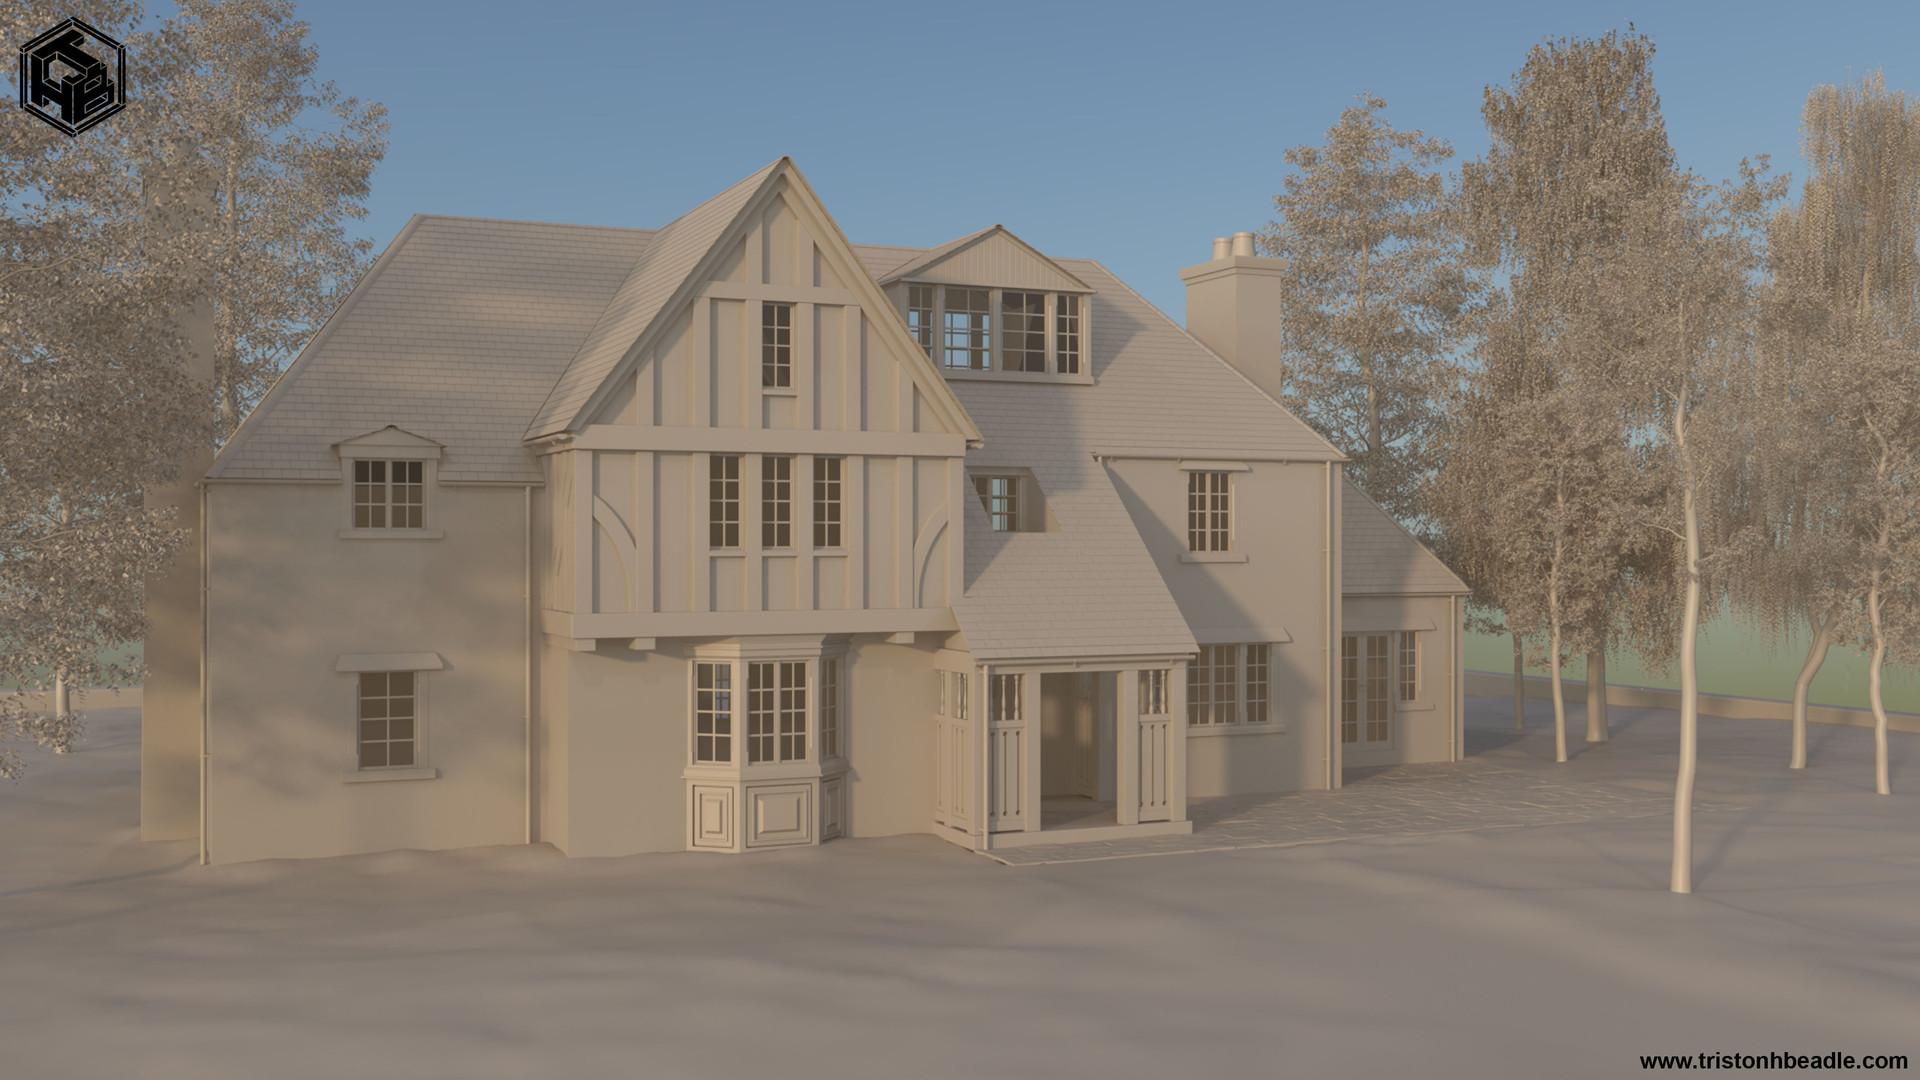 Triston beadle spach alspaugh house